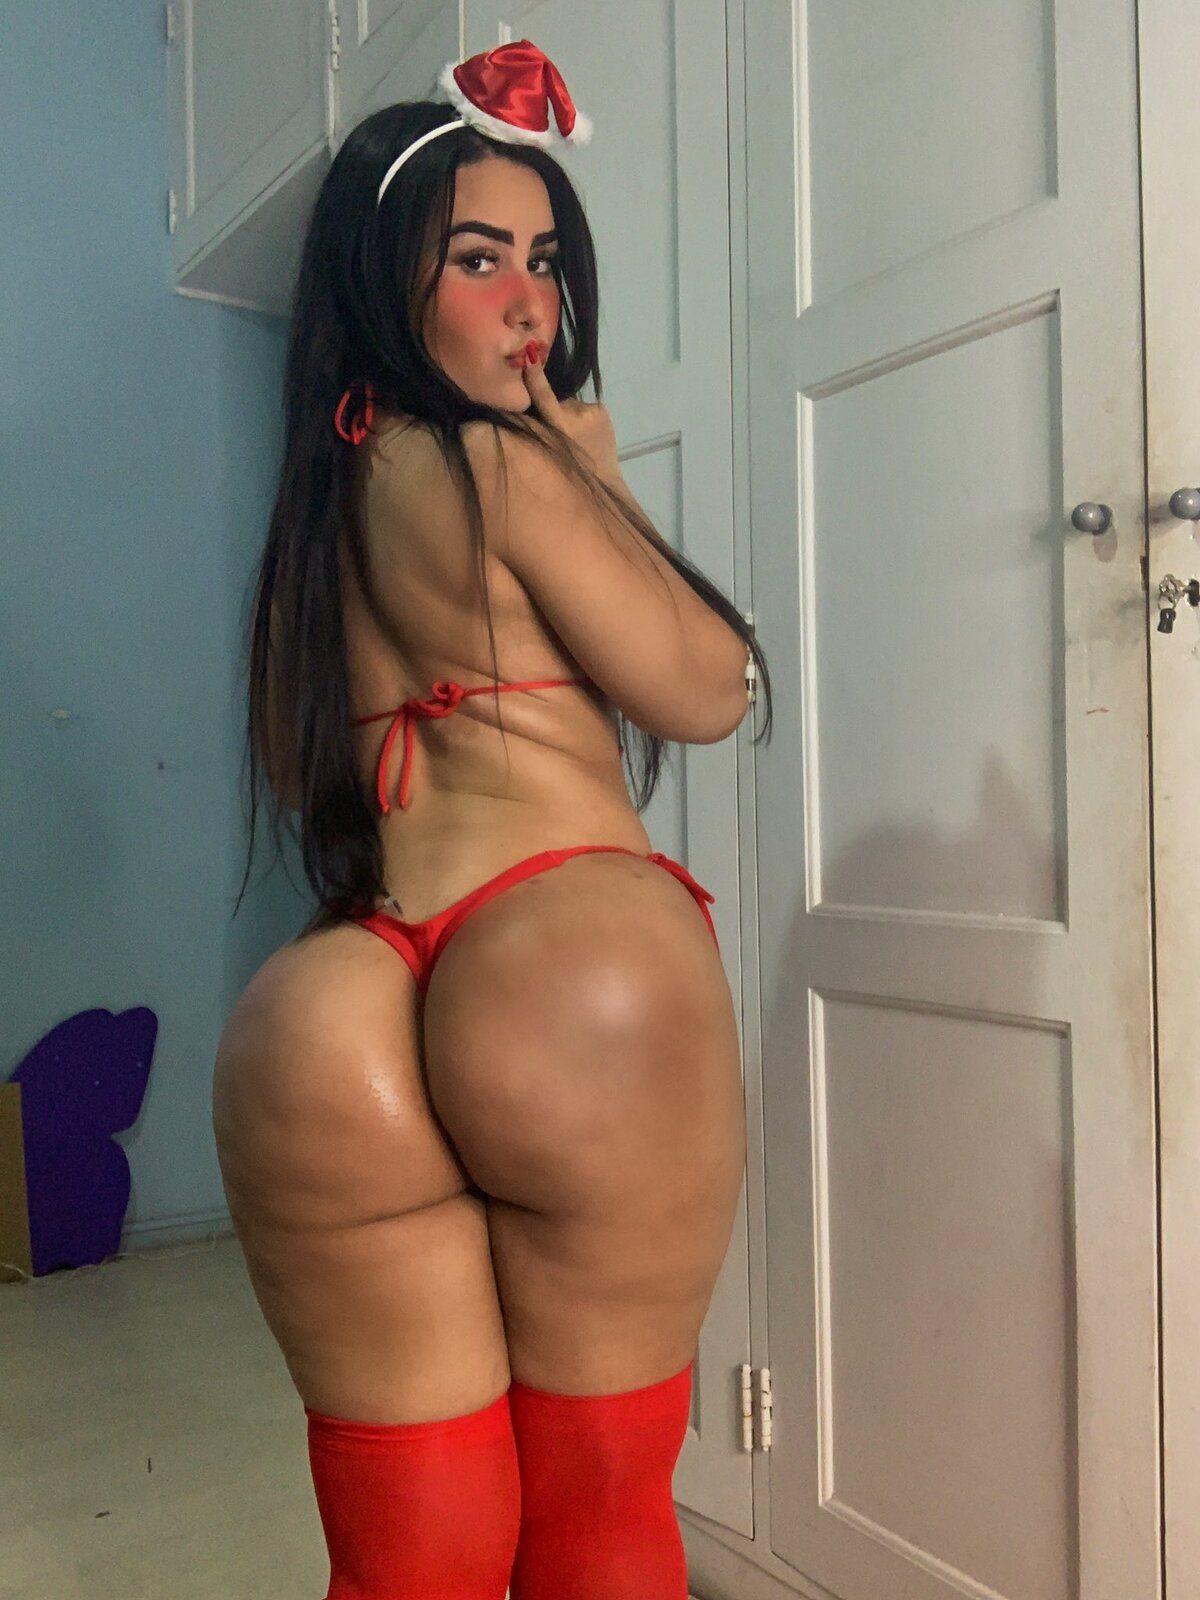 Victoria Matosa Onlyfans Nudes Leaks 0004